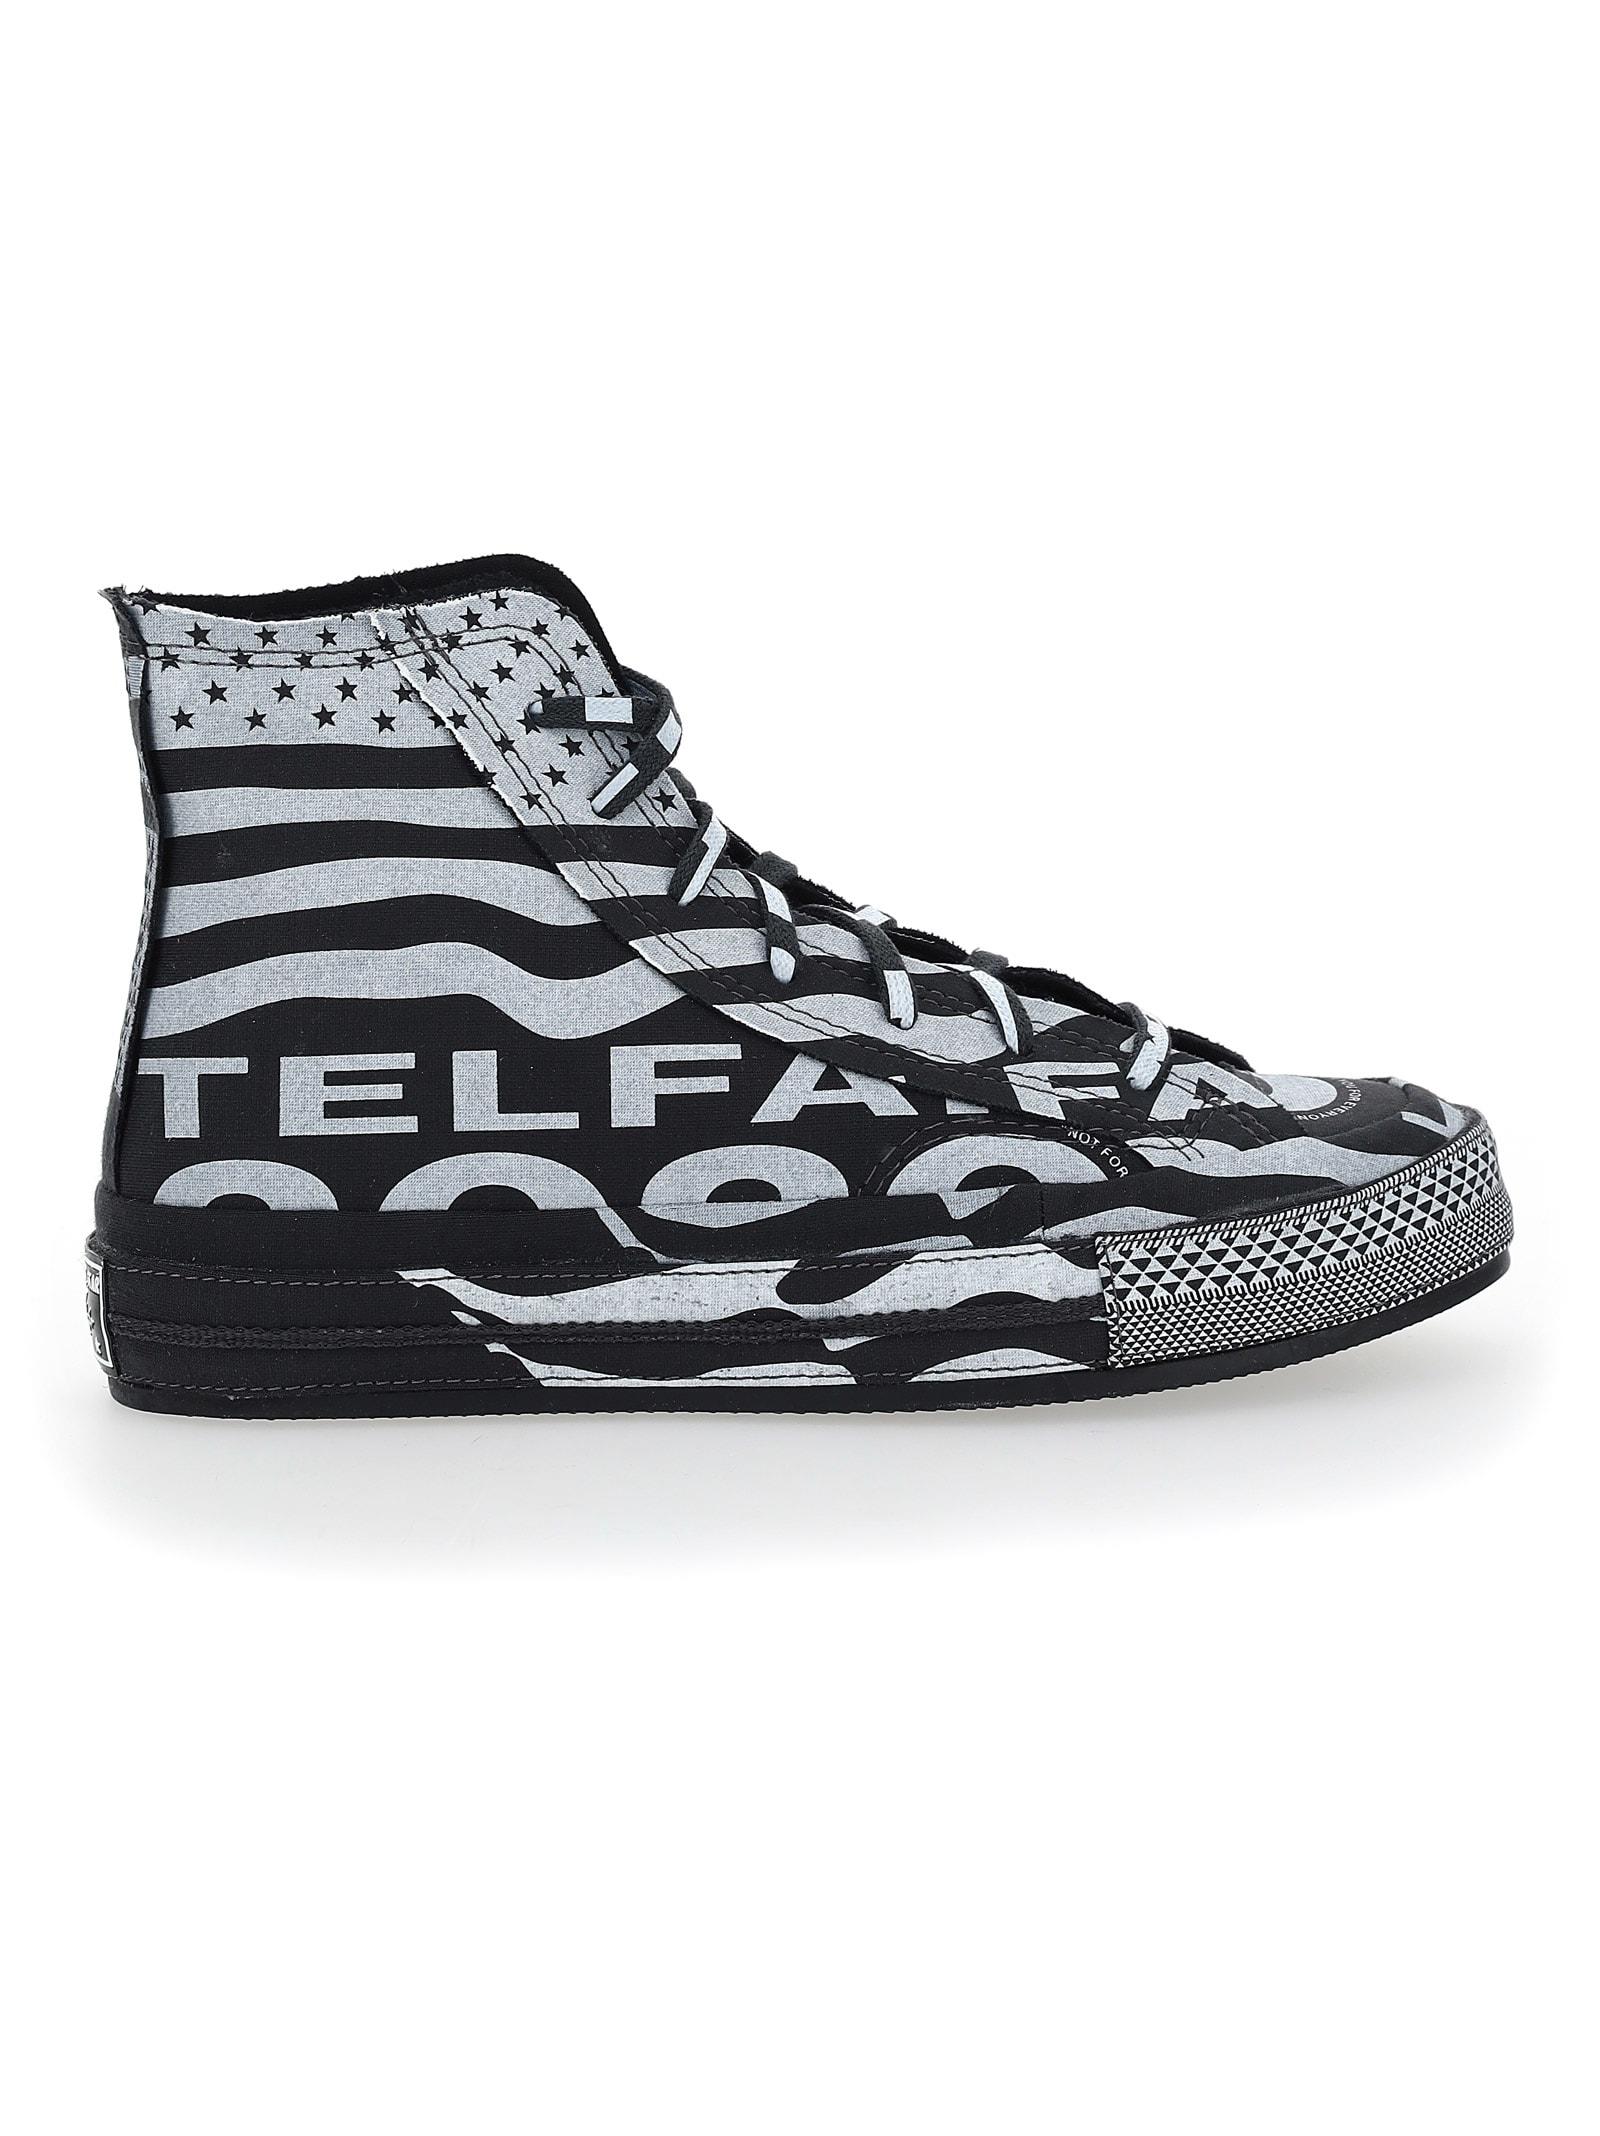 Telfar Shoes X CONVERSE SNEAKERS